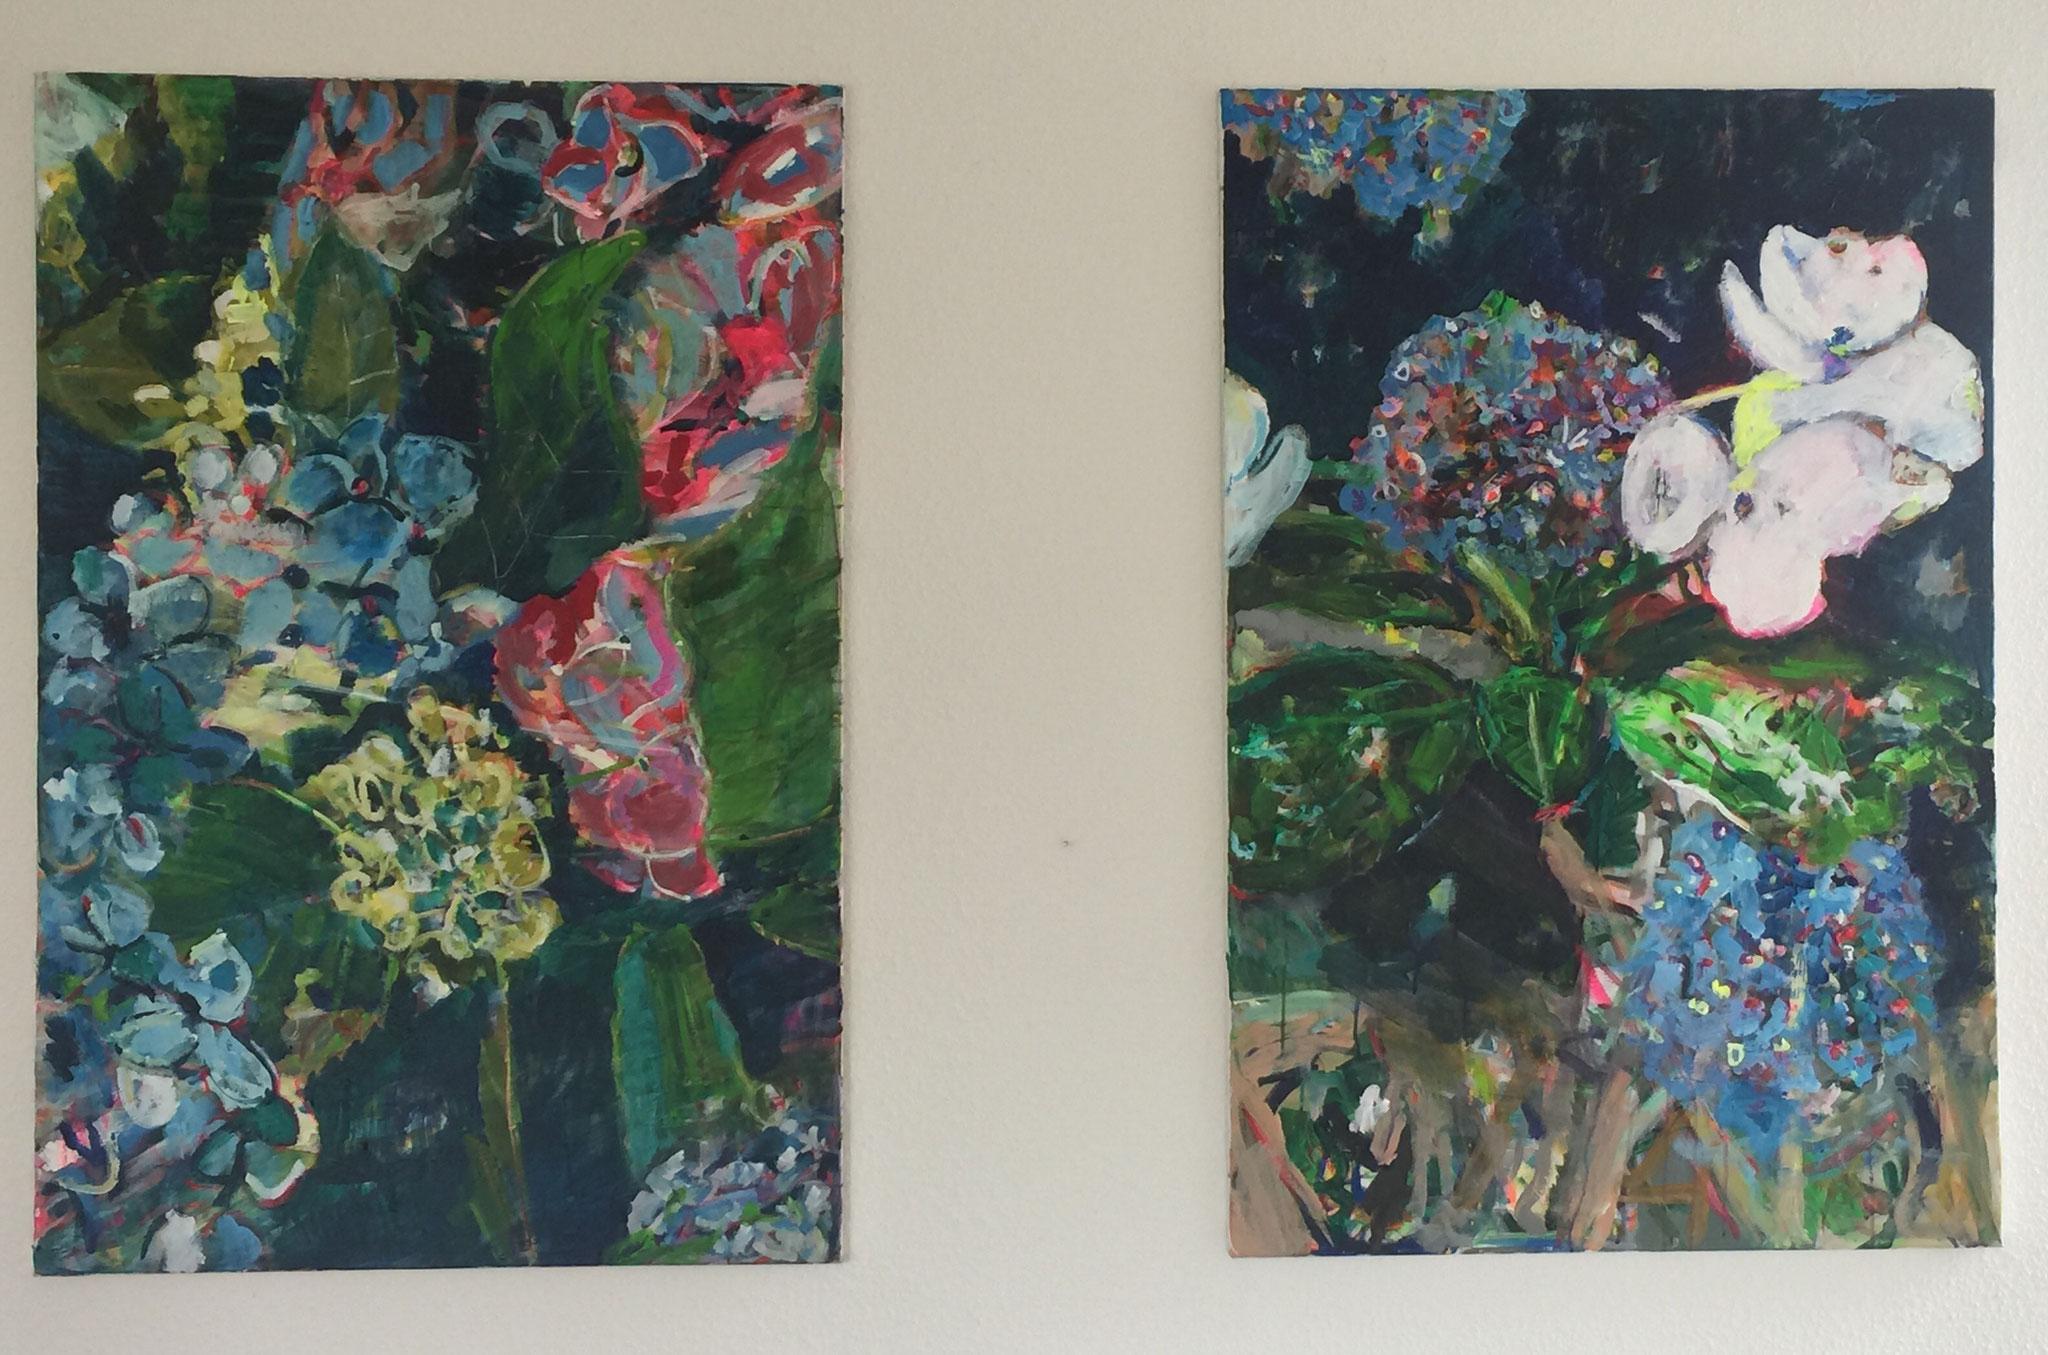 Hortensien 2 und 3,  je 120x80,  acrylic on canvas